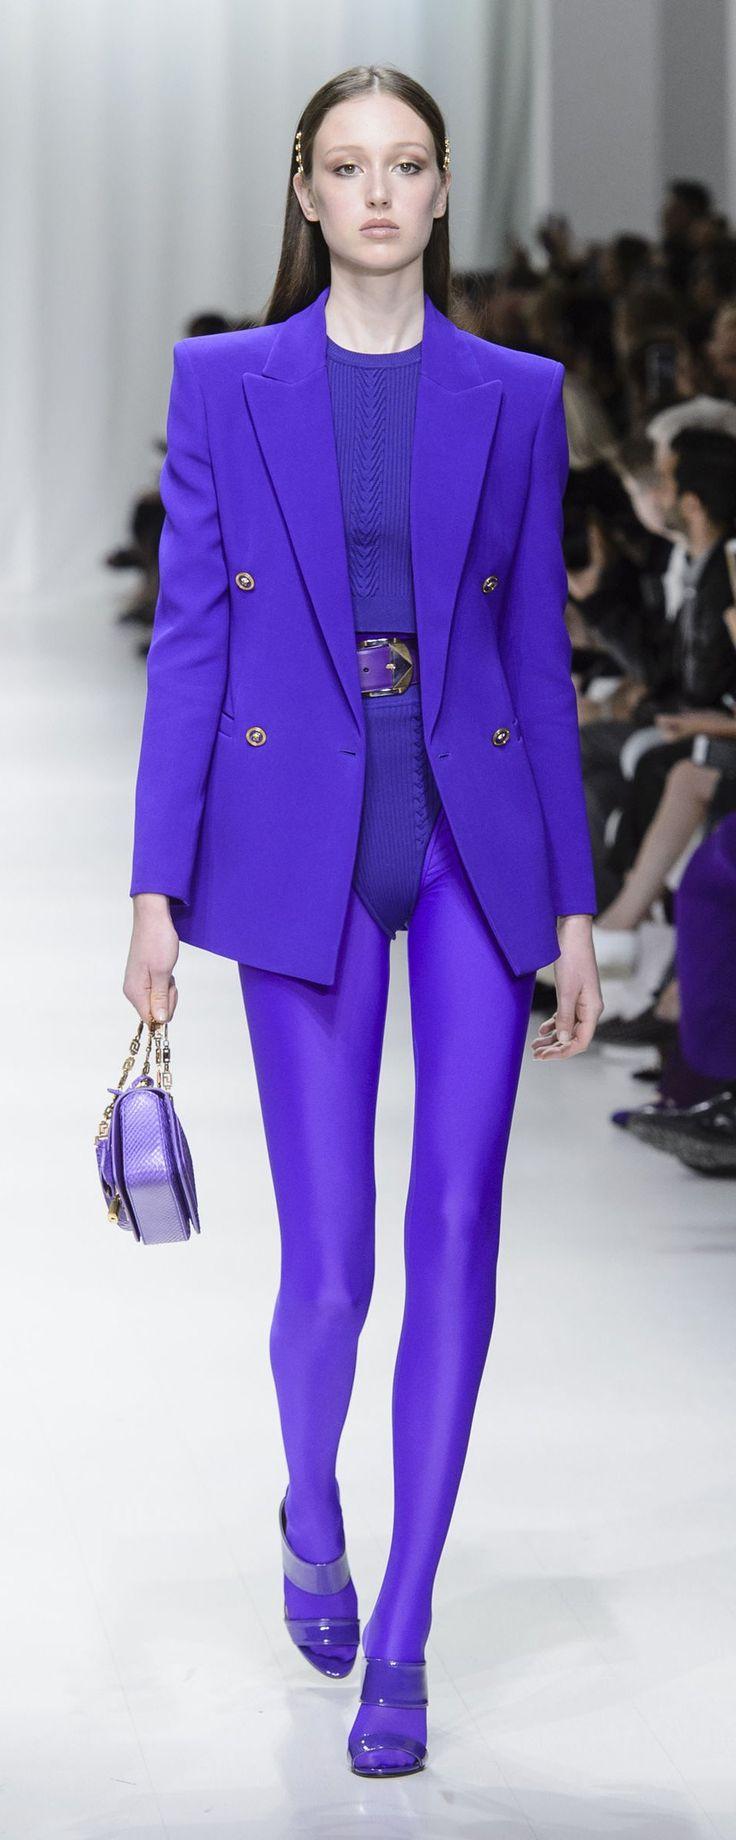 Versace Spring-summer 2018 - Ready-to-Wear - http://www.orientpalms.com/Versace-6922 - ©ImaxTree